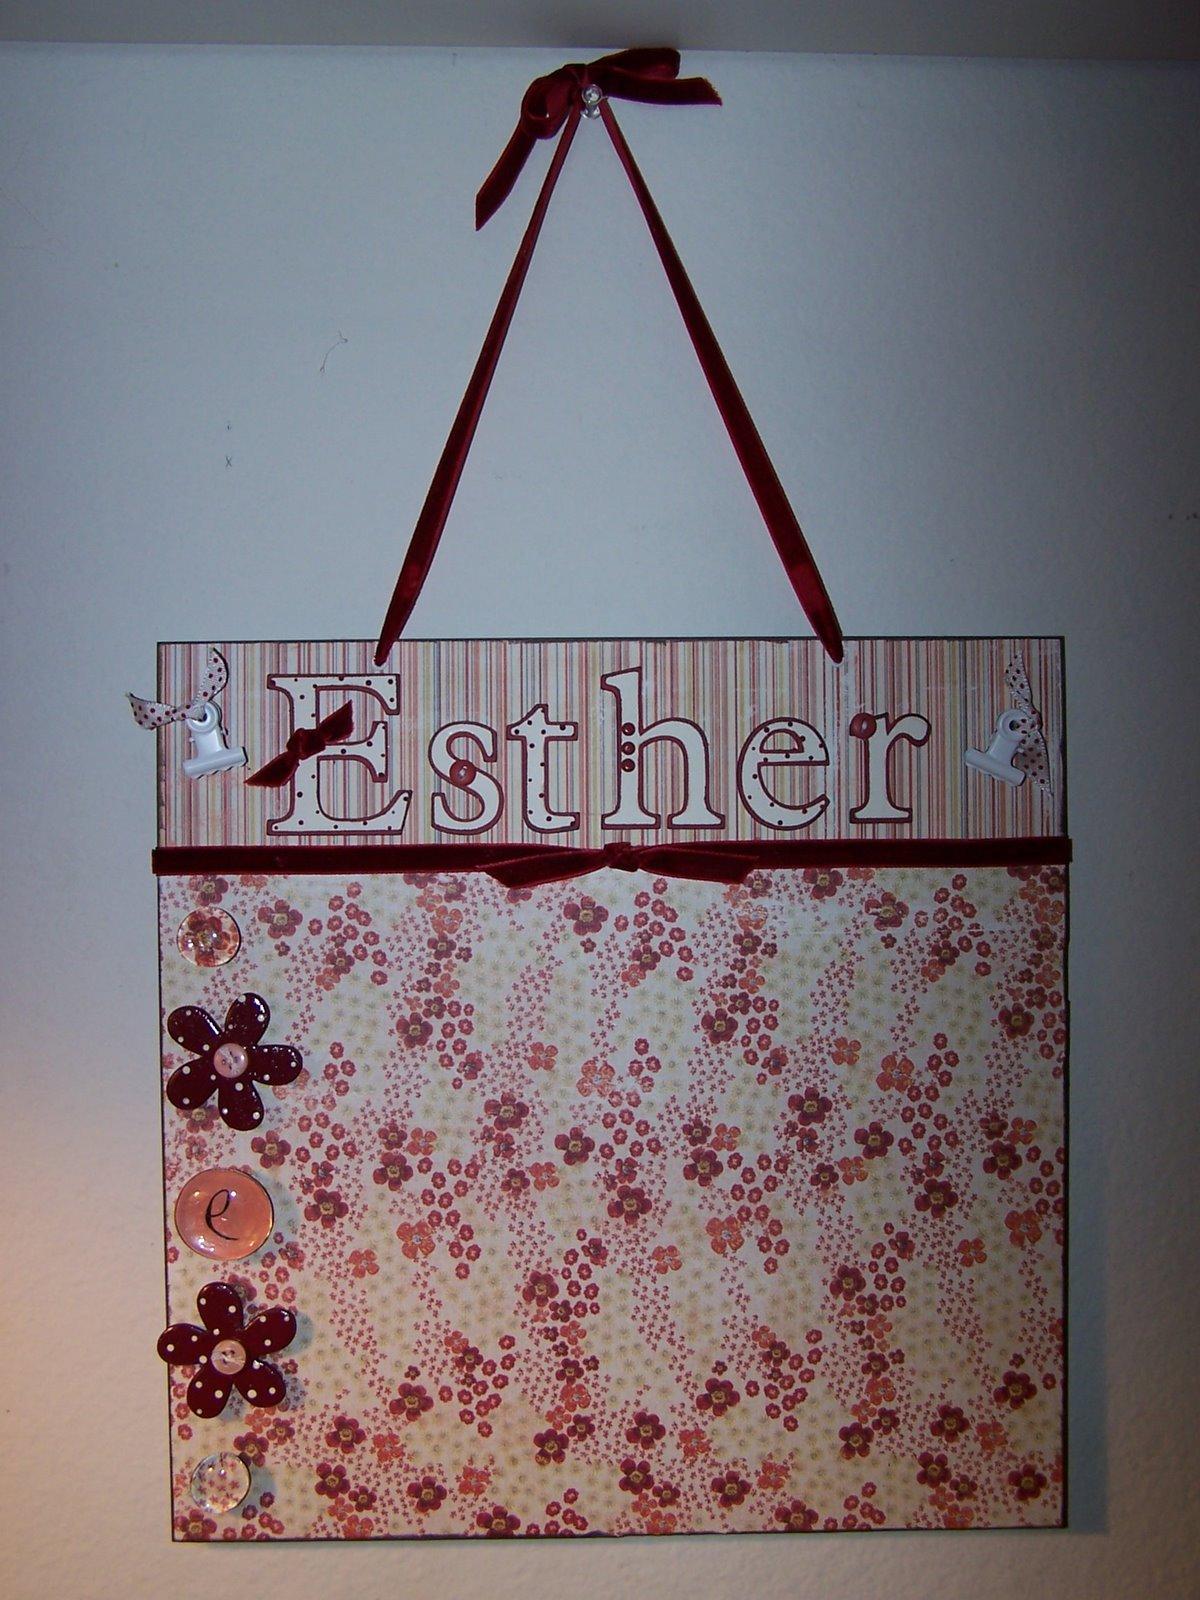 [Esther]